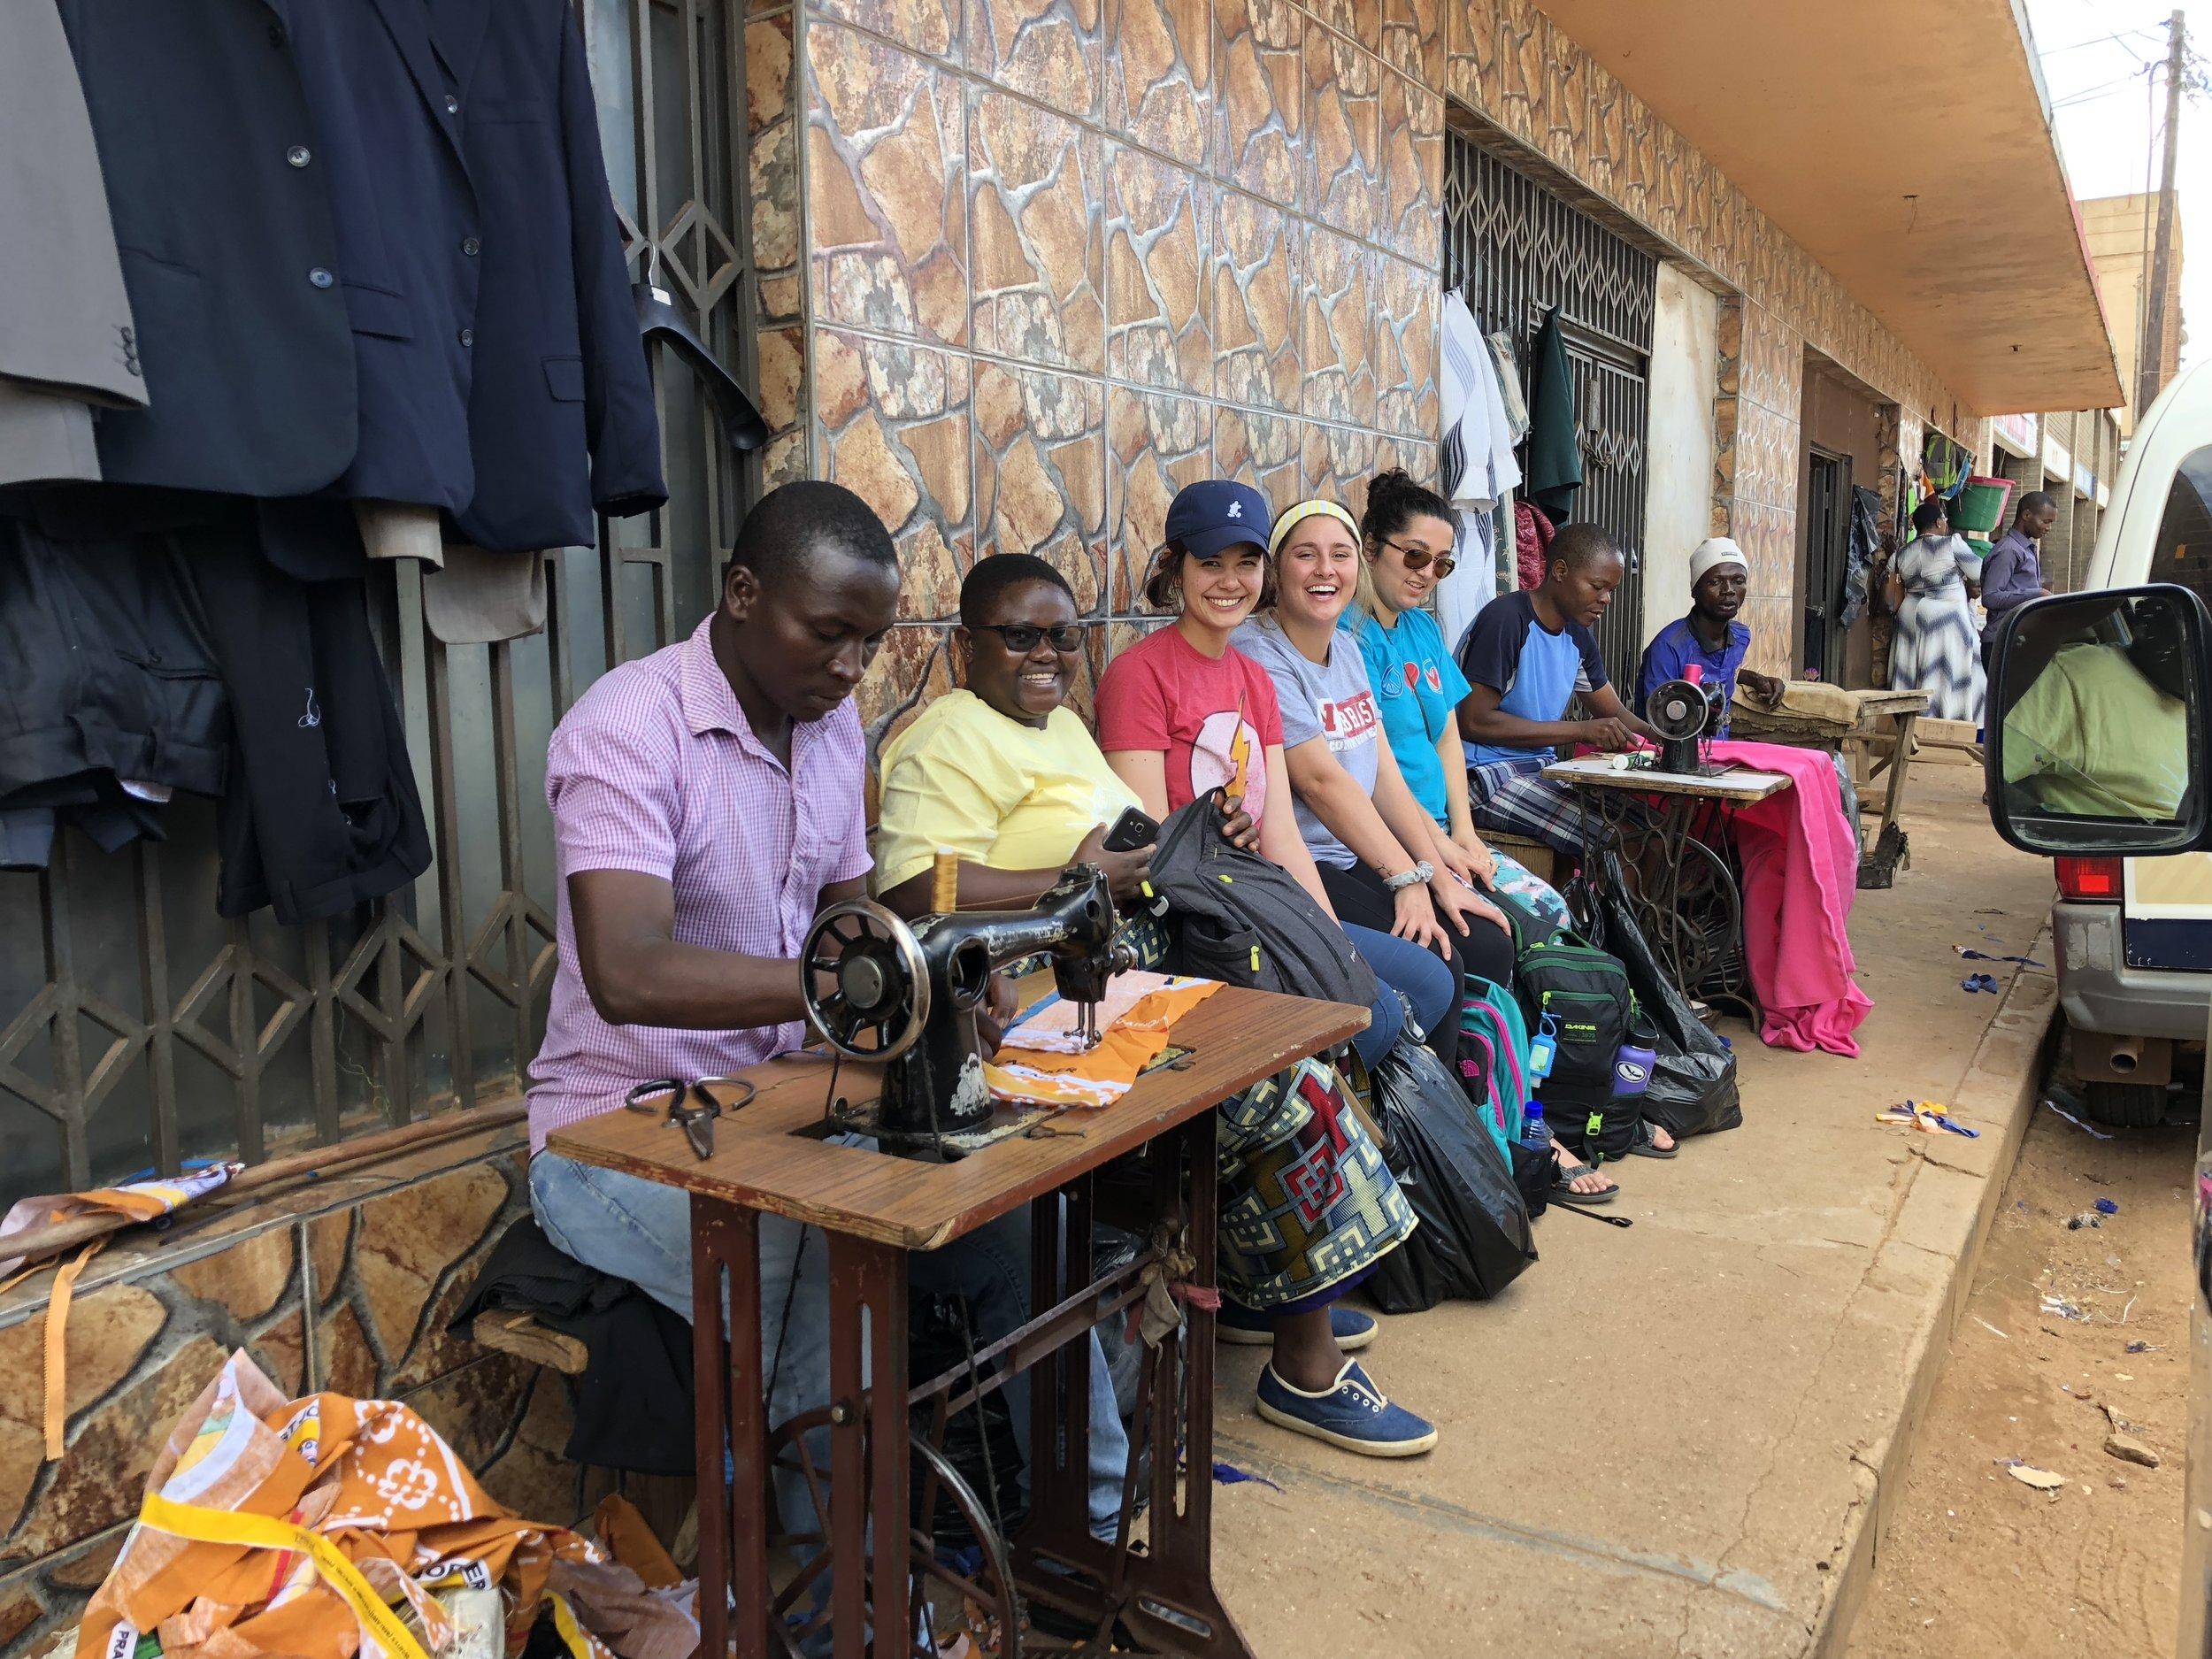 Nyathipa, Maggie, Karly and Sophia prepare fabric to make hospital blankets